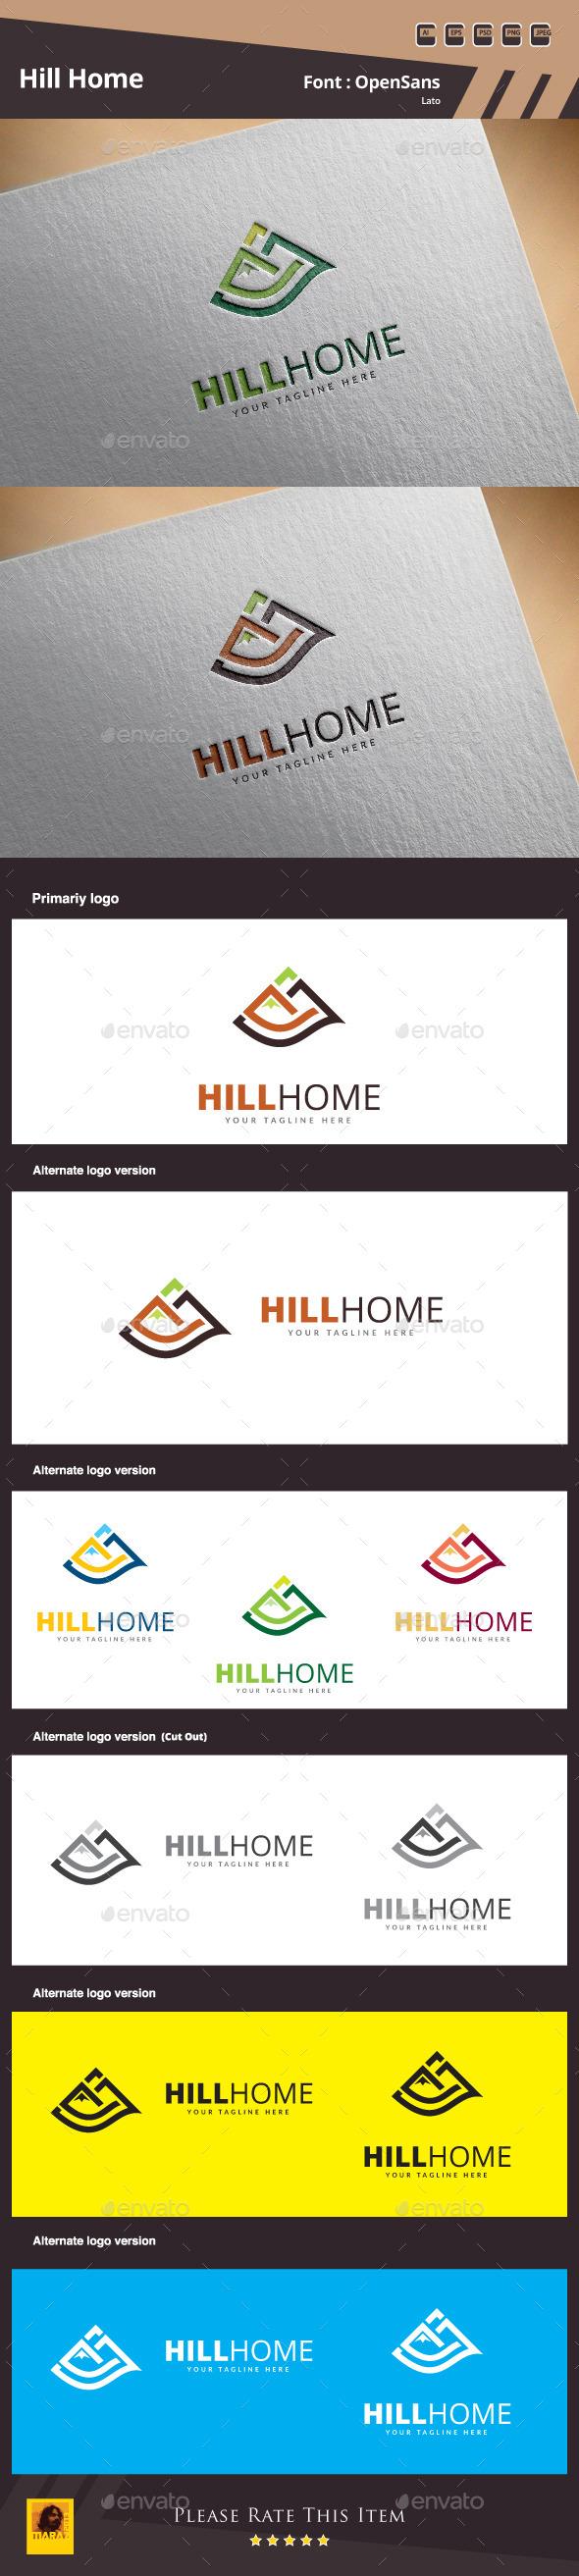 Hill Home Logo Template - Buildings Logo Templates